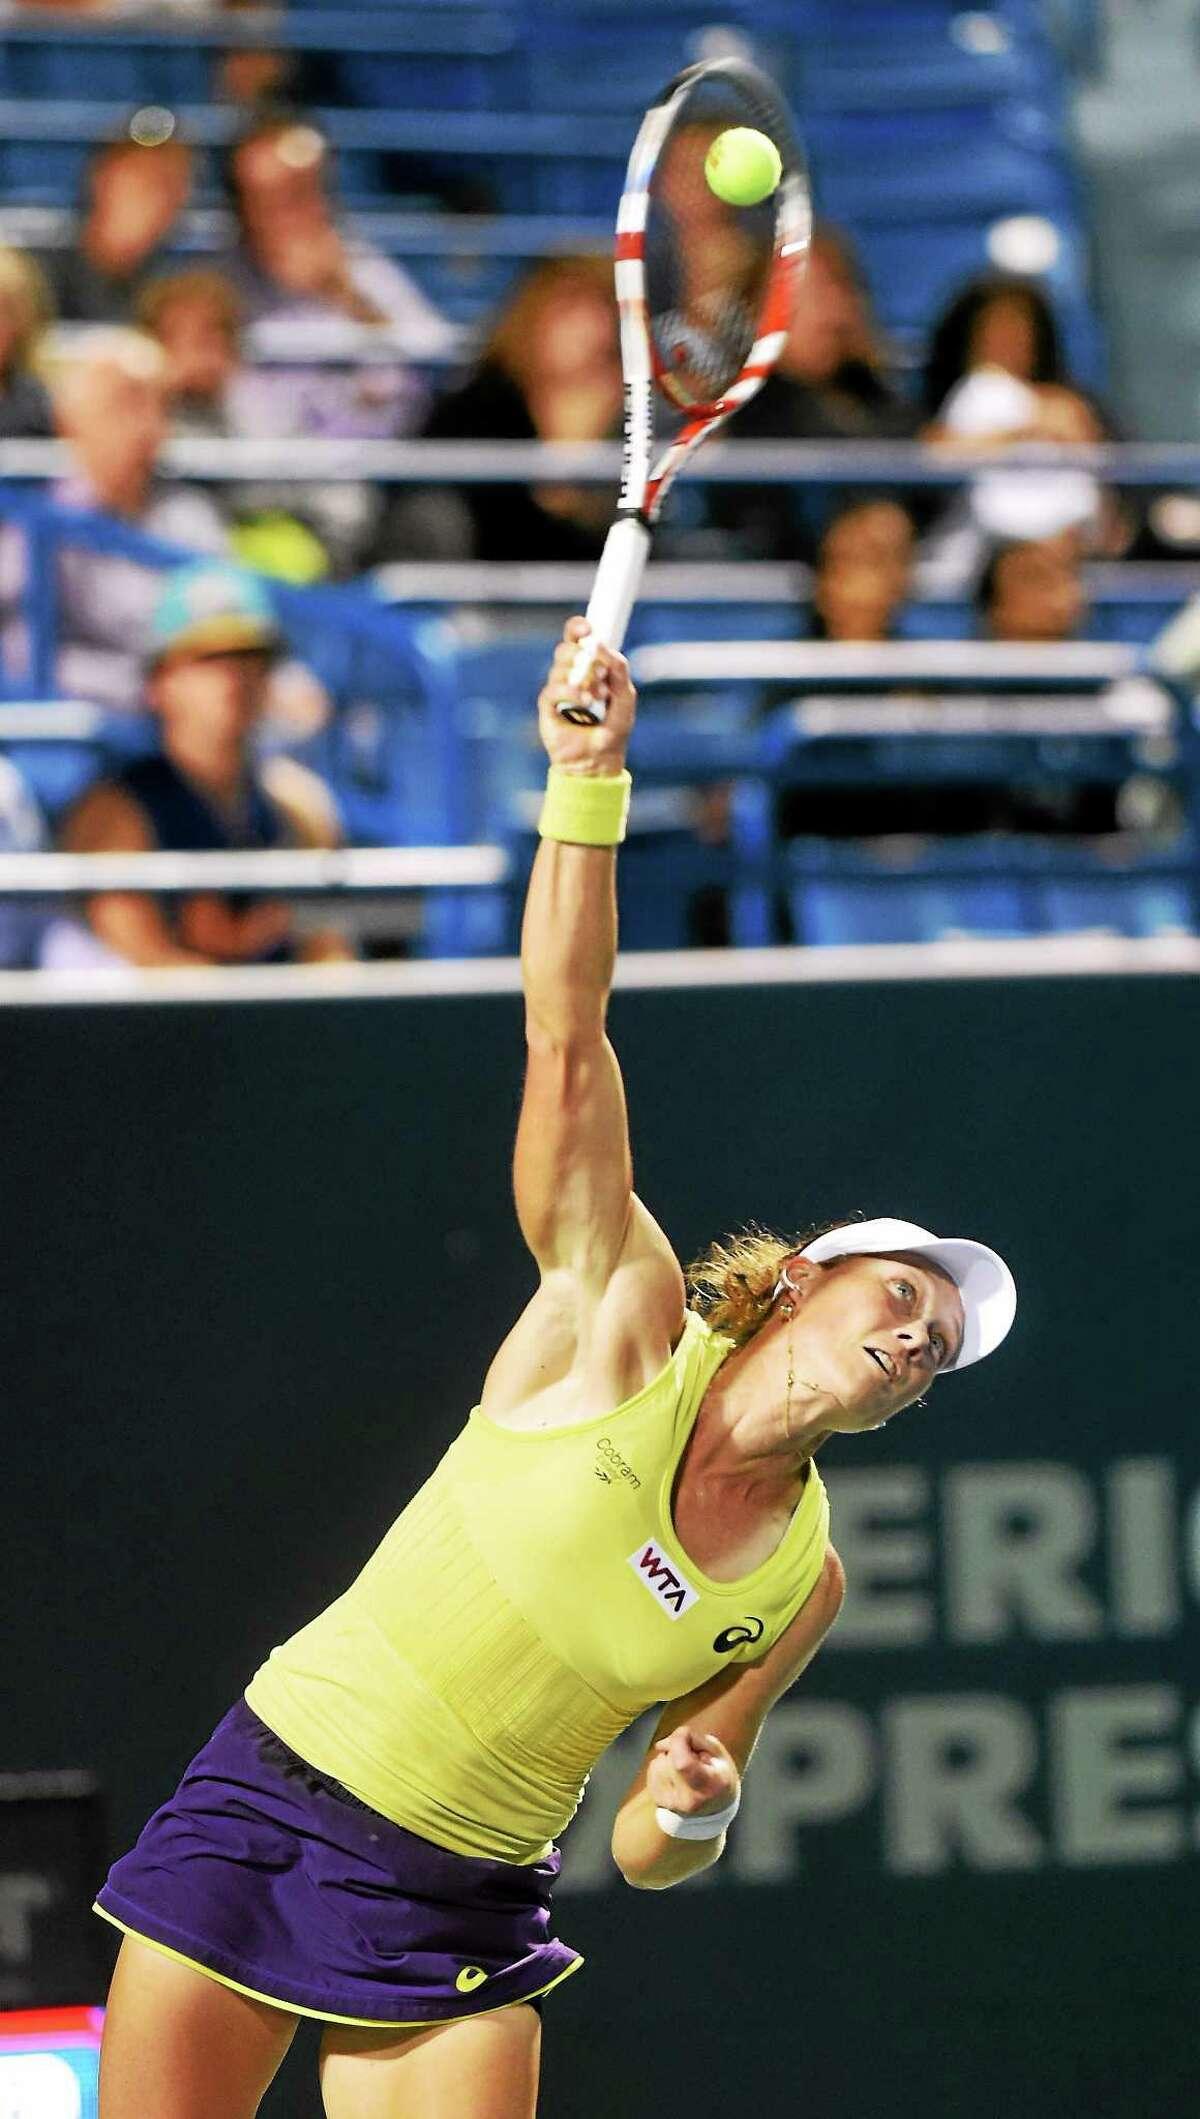 Sam Stosur serves to Kirsten Flipkens during her 6-3, 4-6, 6-3 quarterfinal-round win on Thursday night at the Connecticut Open.